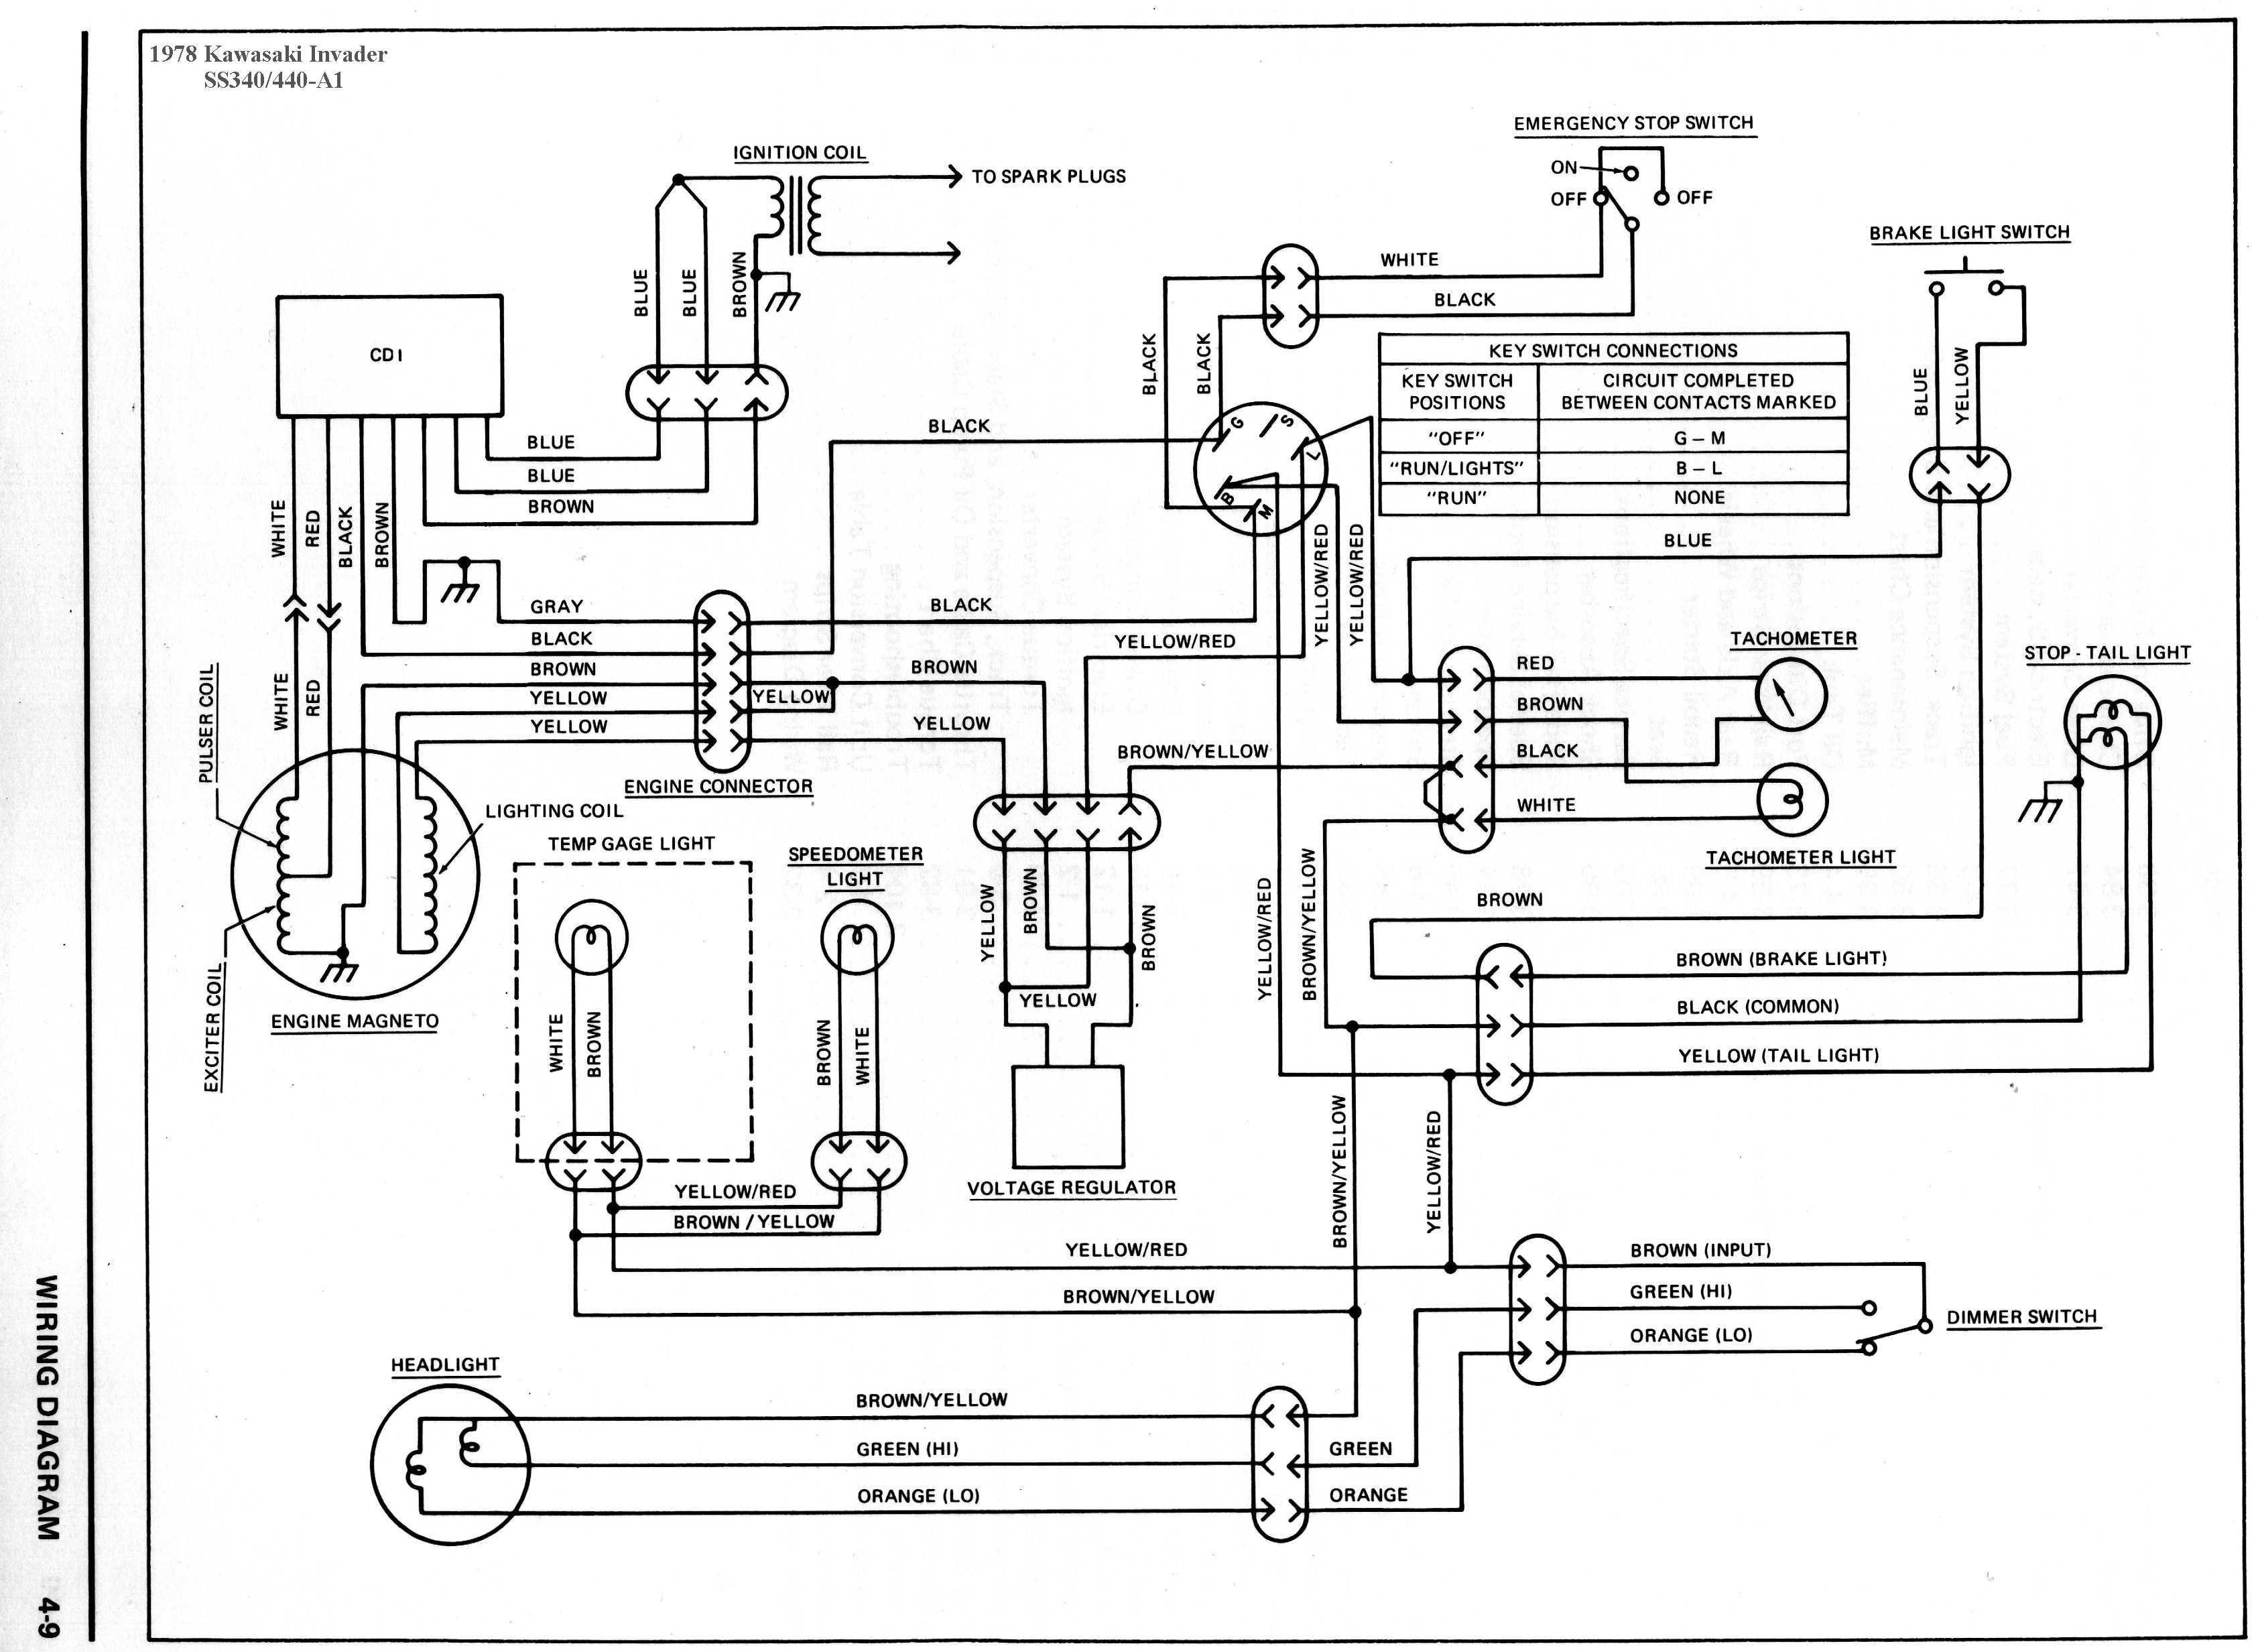 diagram] klf 300 kawasaki 4 wheeler wiring diagram full version hd quality wiring  diagram - forexdiagrams.i-ras.it  i-ras.it